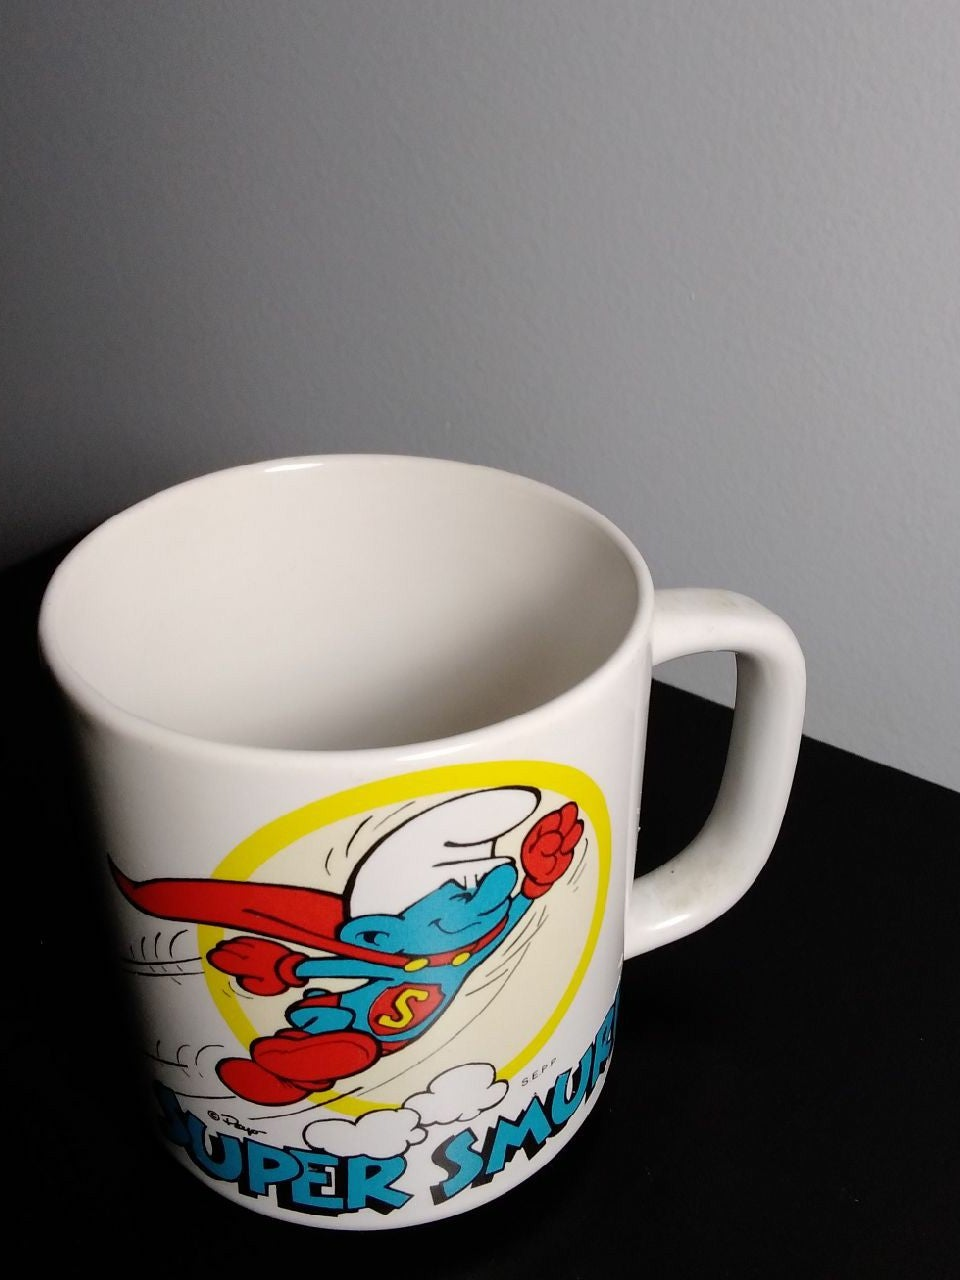 Vintage Smurf cup